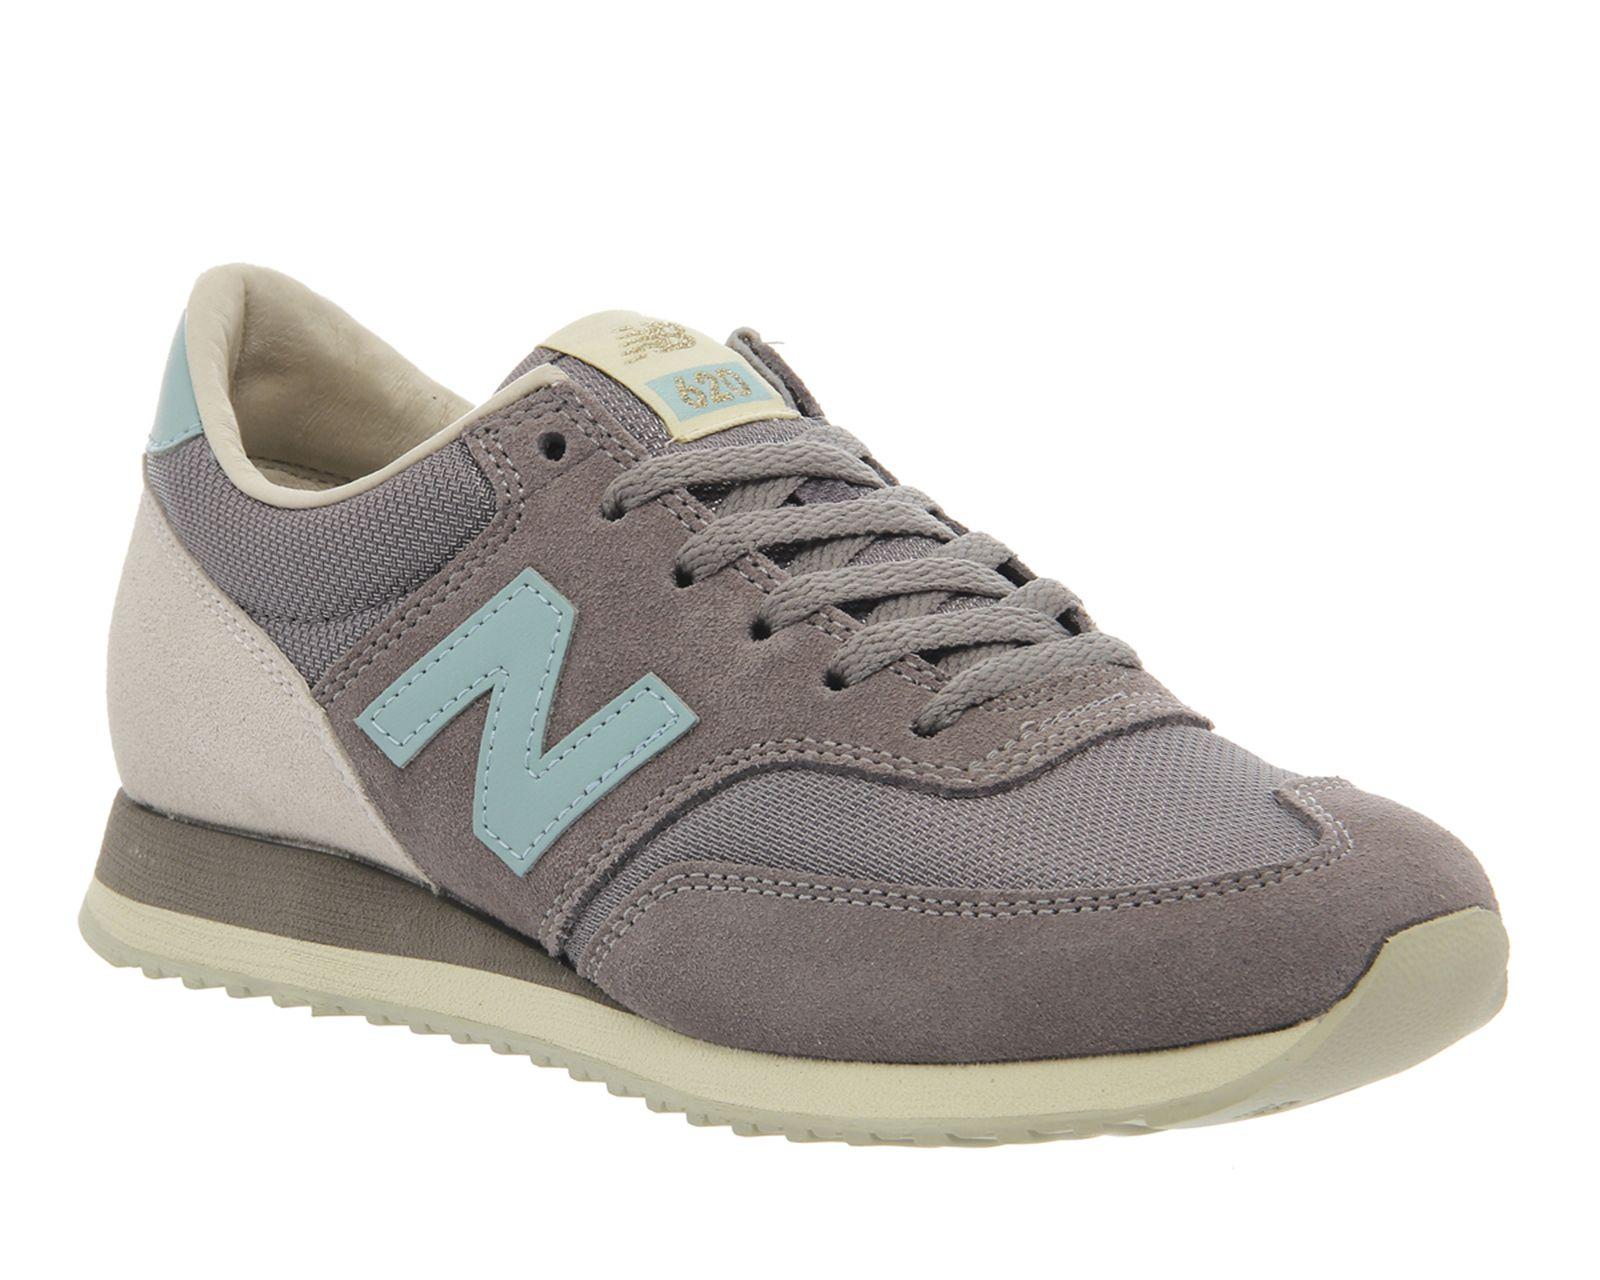 New Balance Sneakers 620 Grey Sky Blue